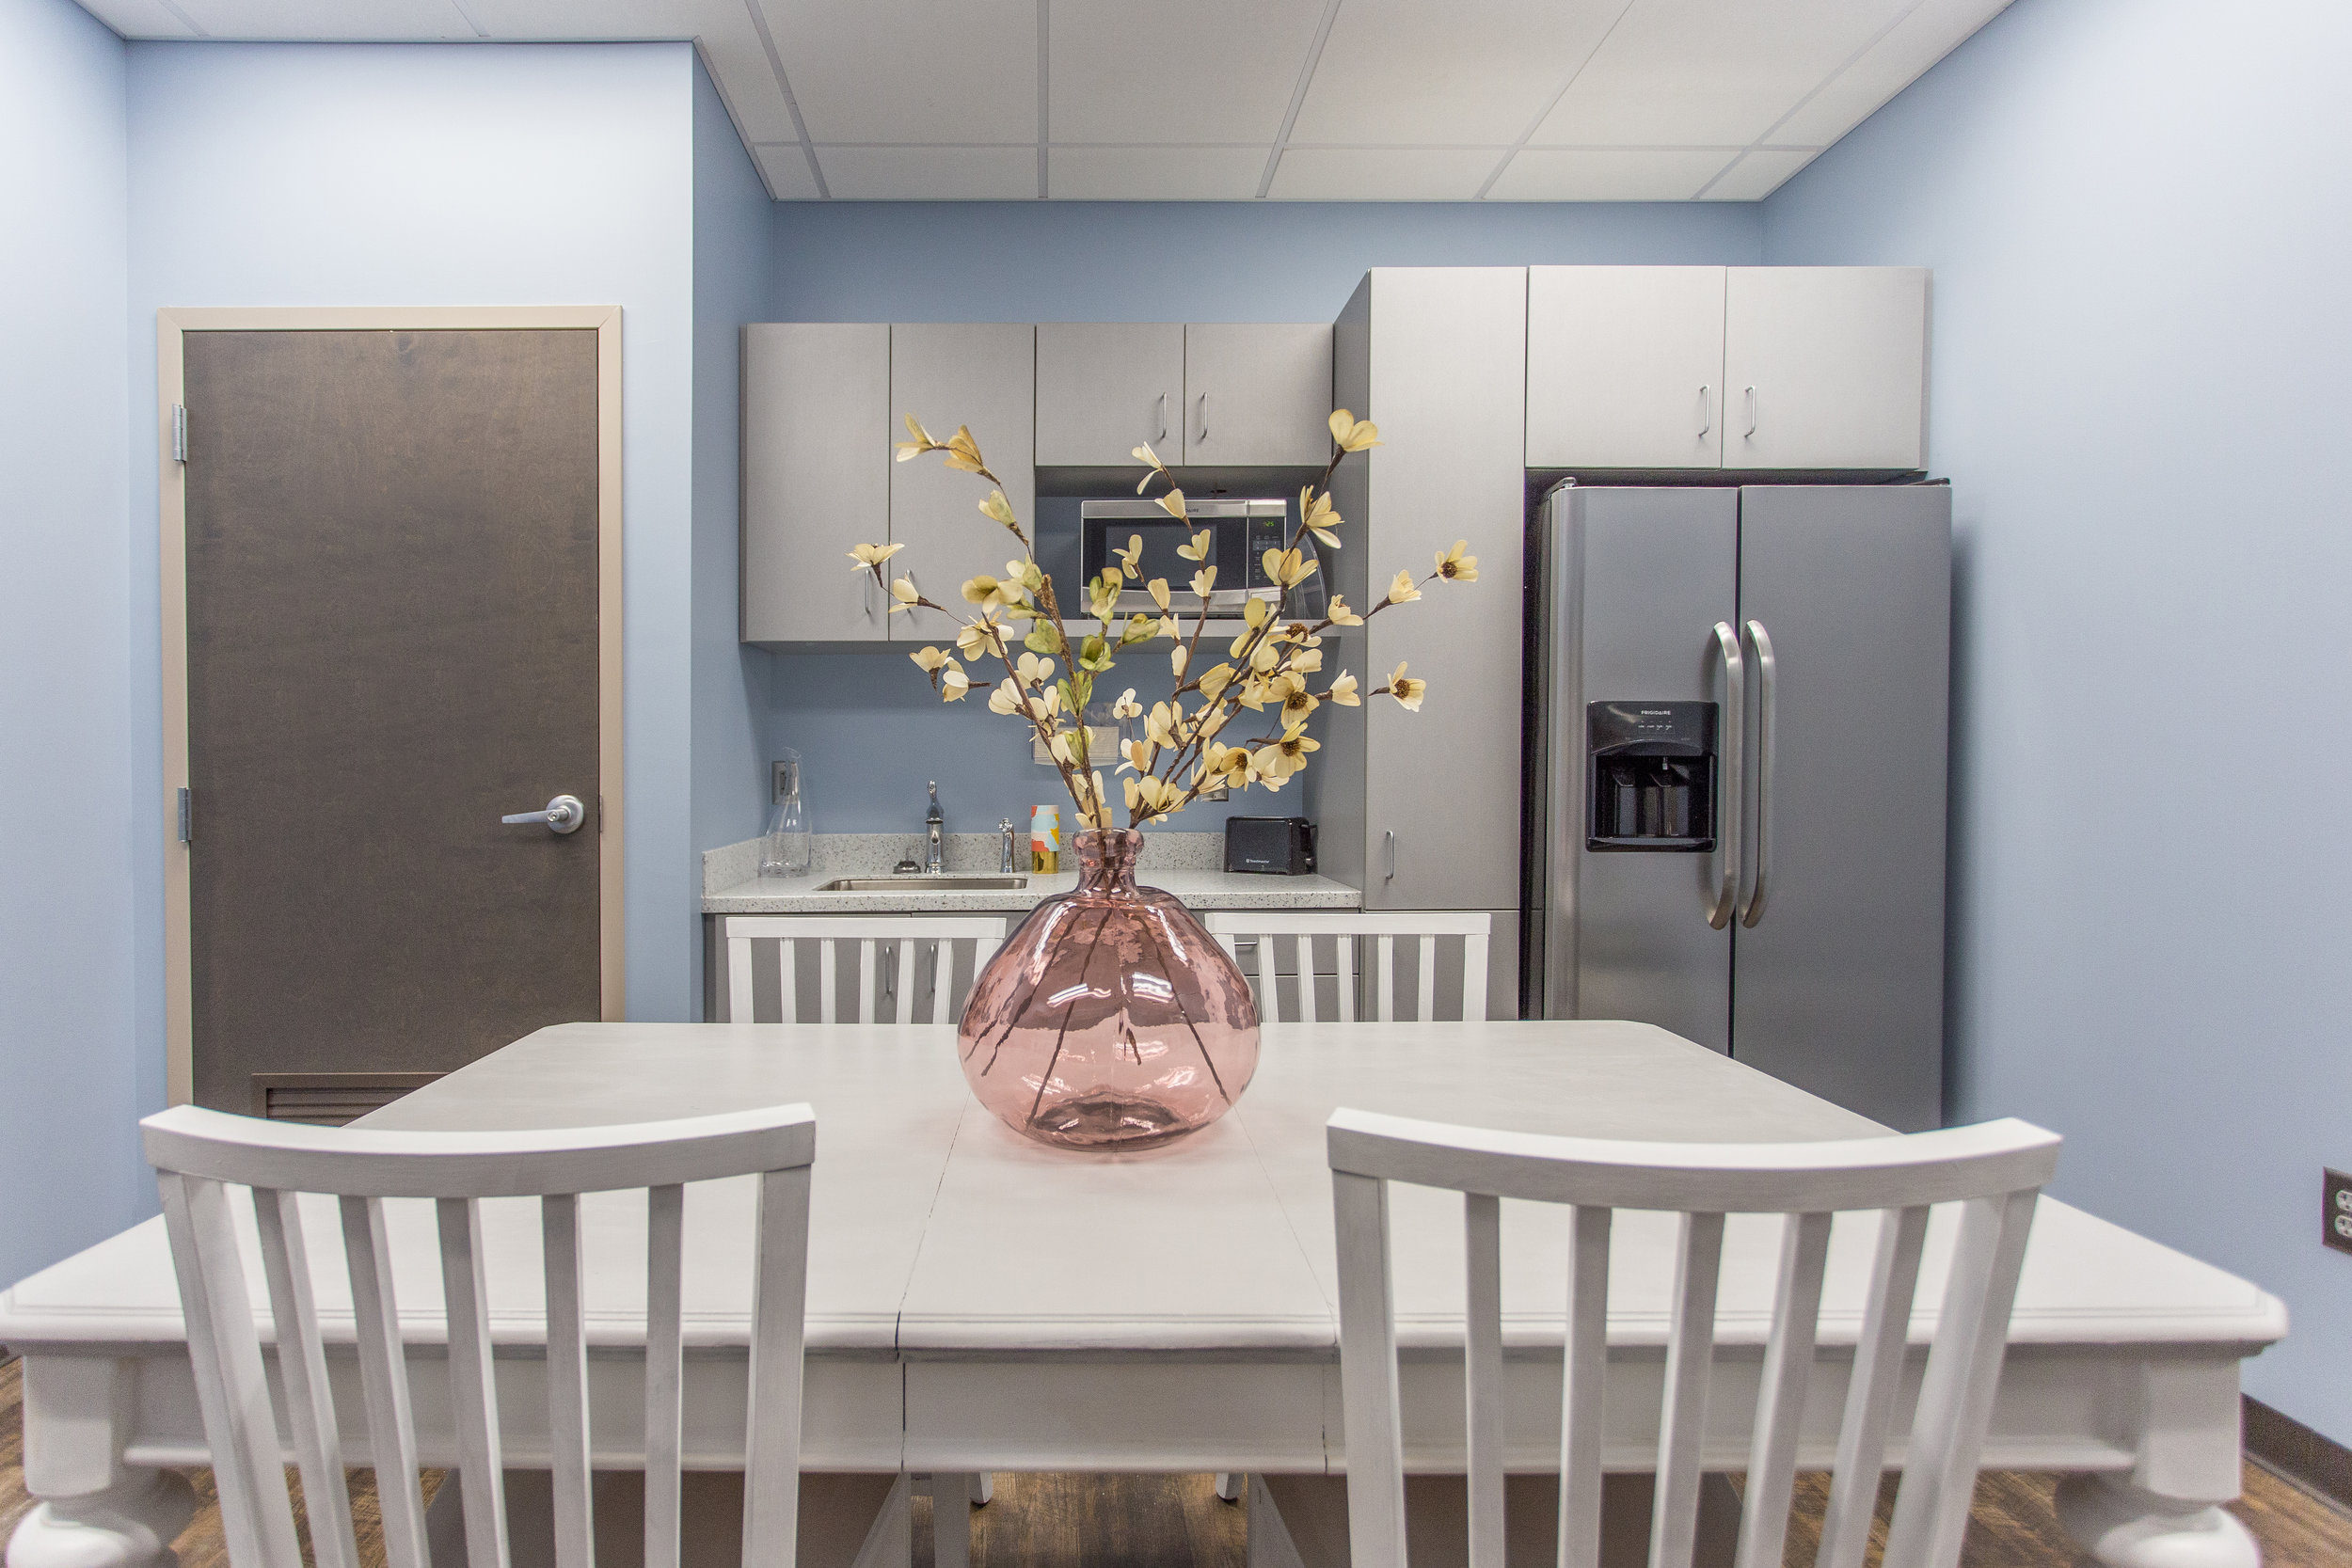 Employee break room complete with kitchen.